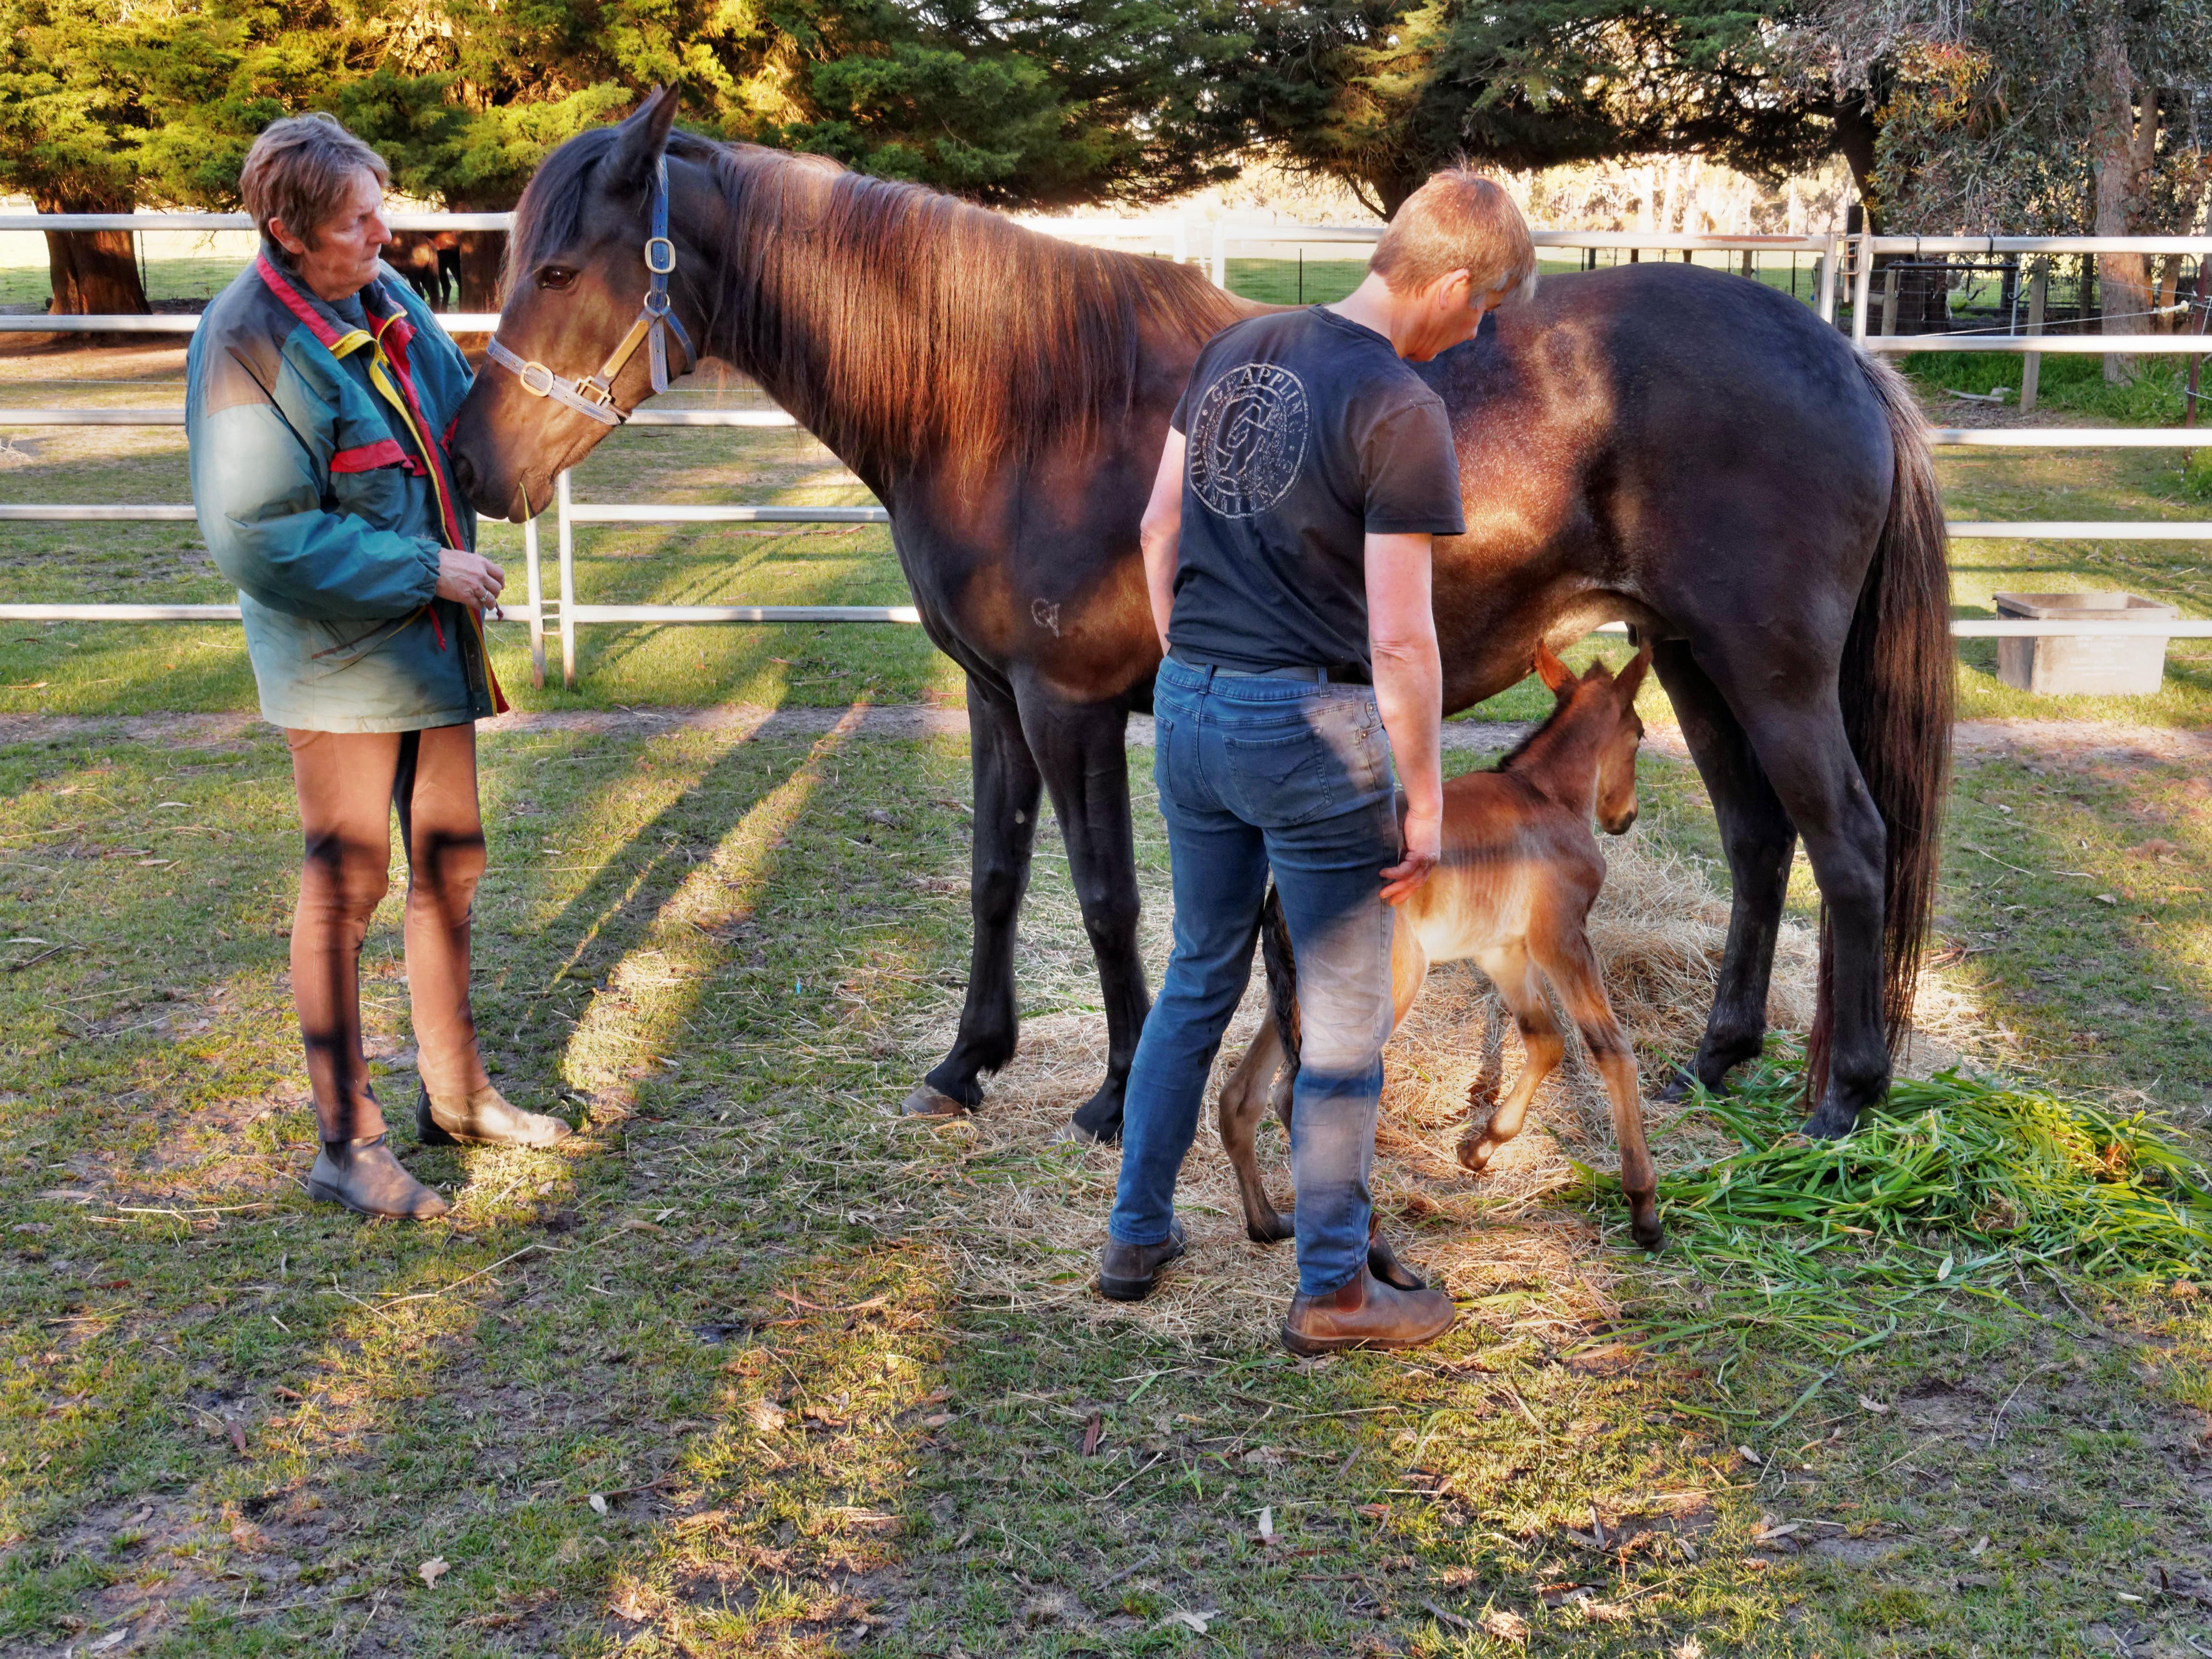 New-foal-19.jpeg